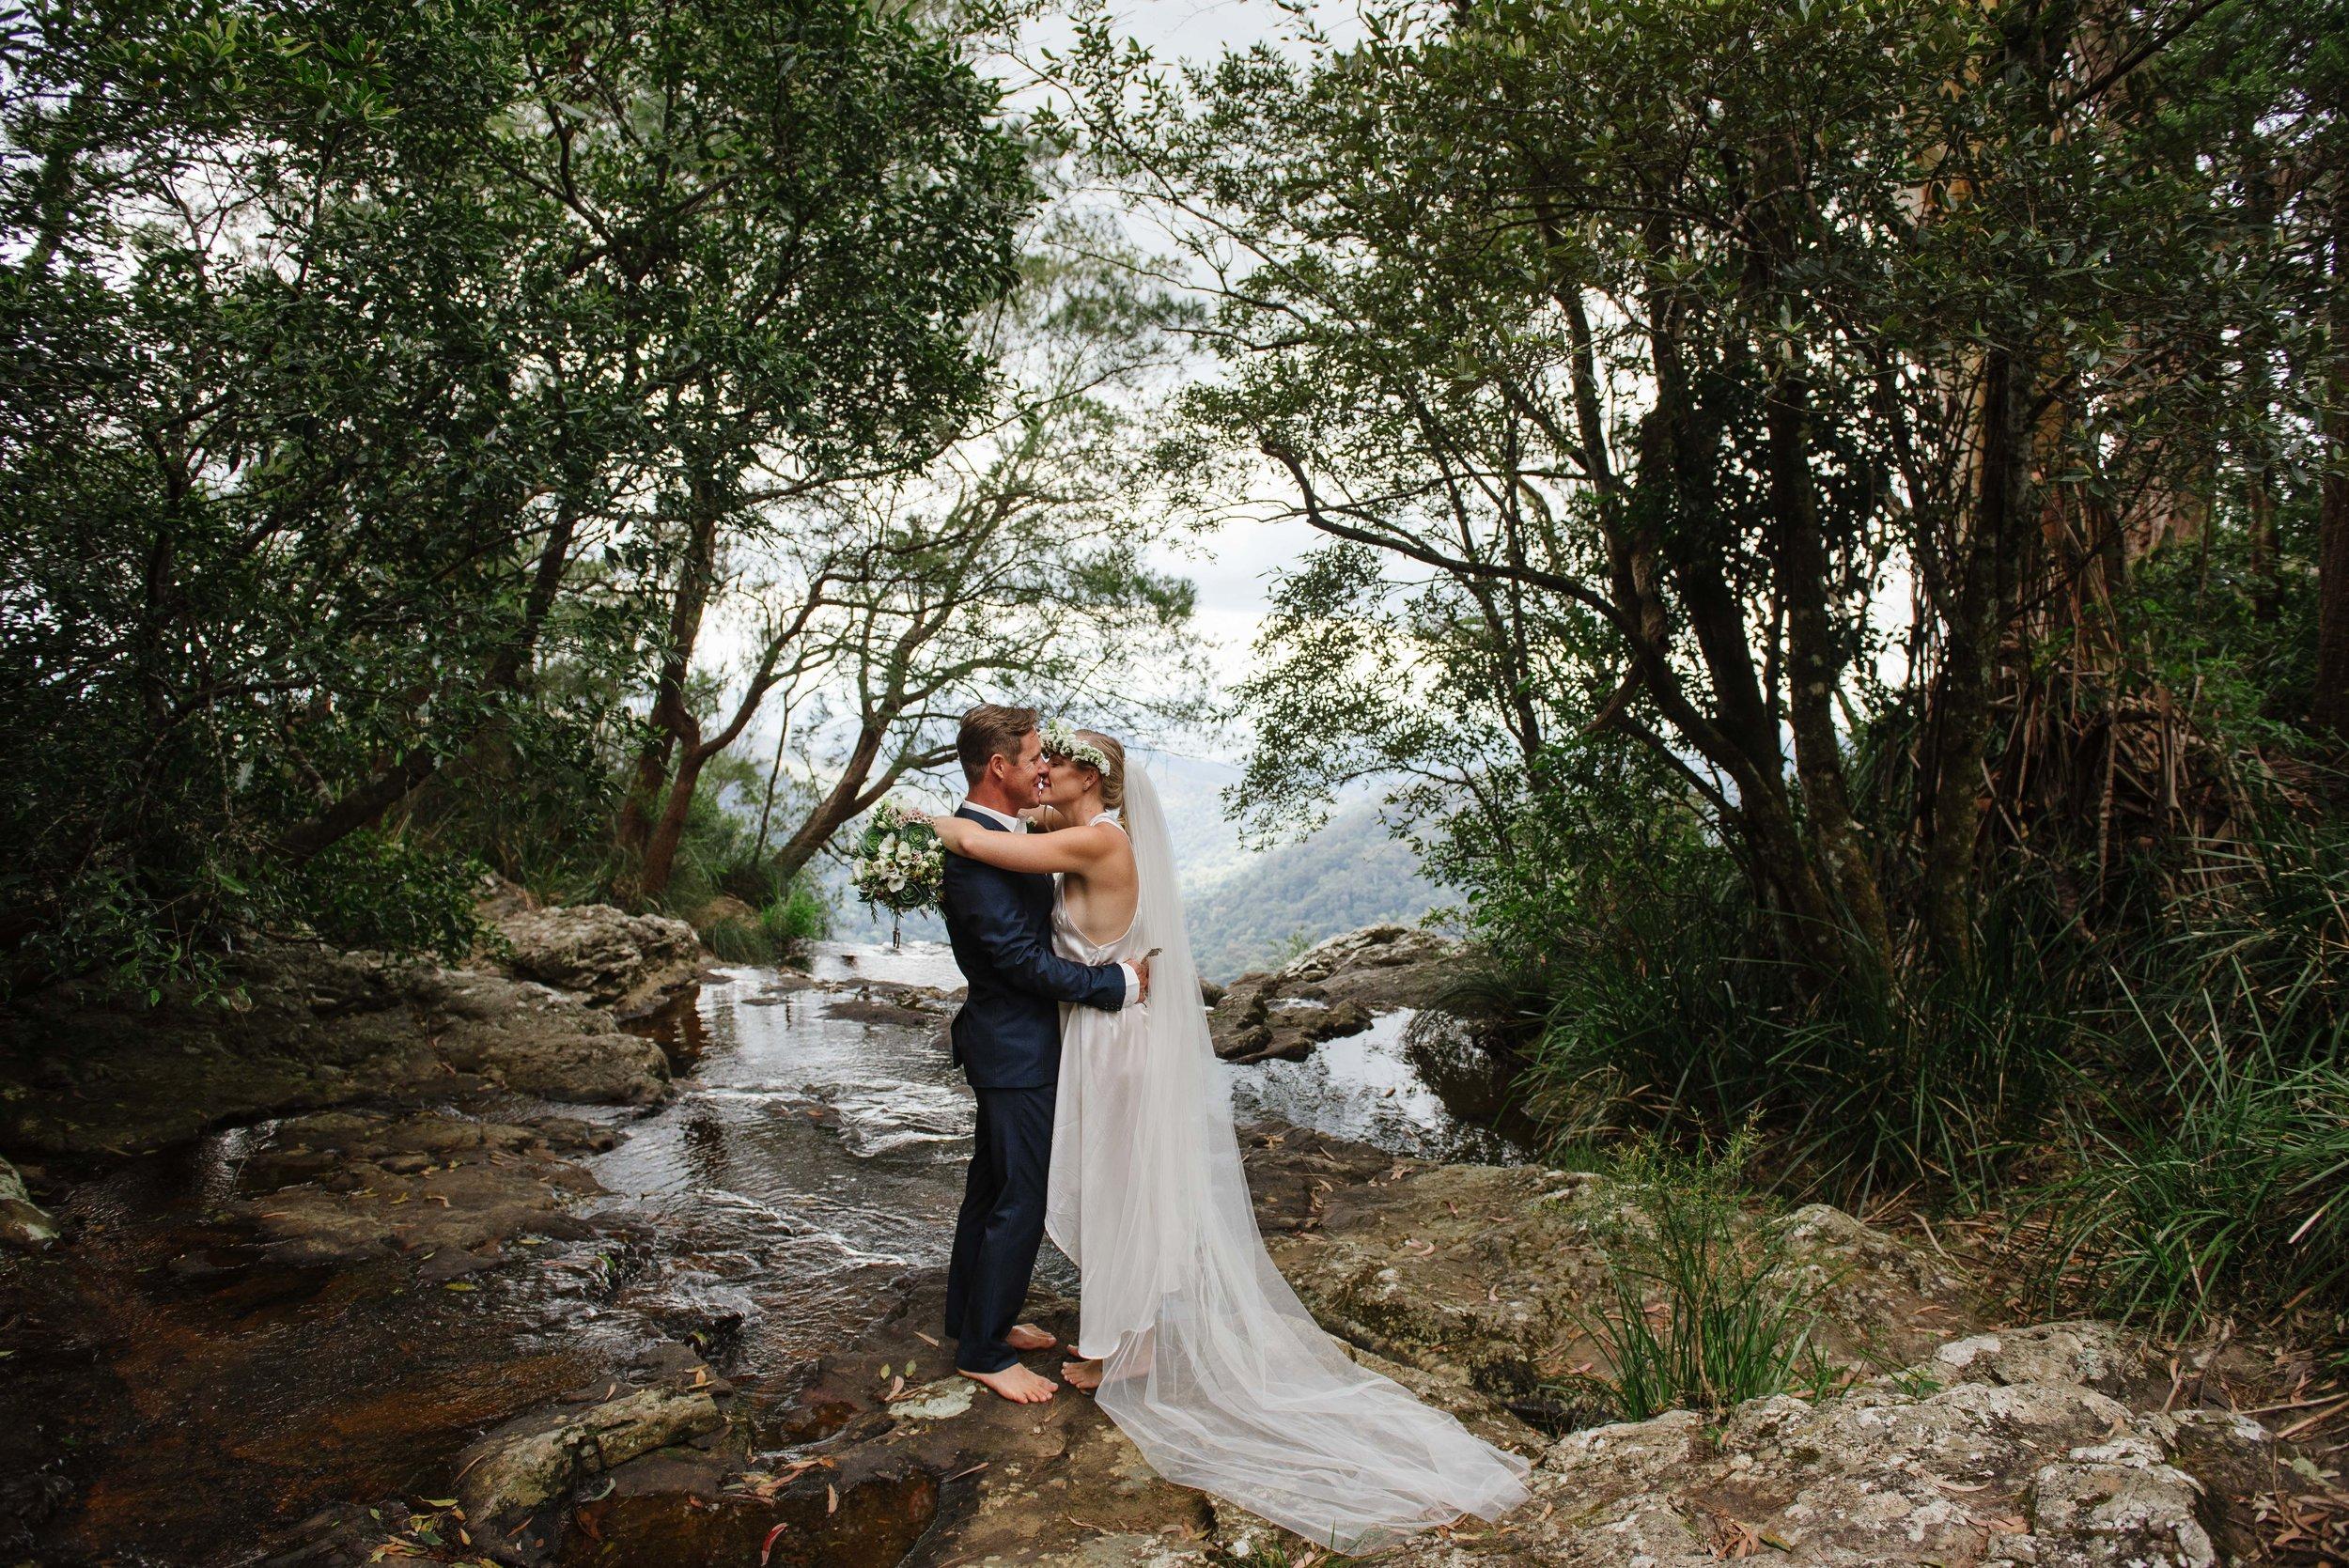 Carla and Luke- wedding photographer, byron bay wedding and family photographer, tweed heads wedding and family photography-272.jpg